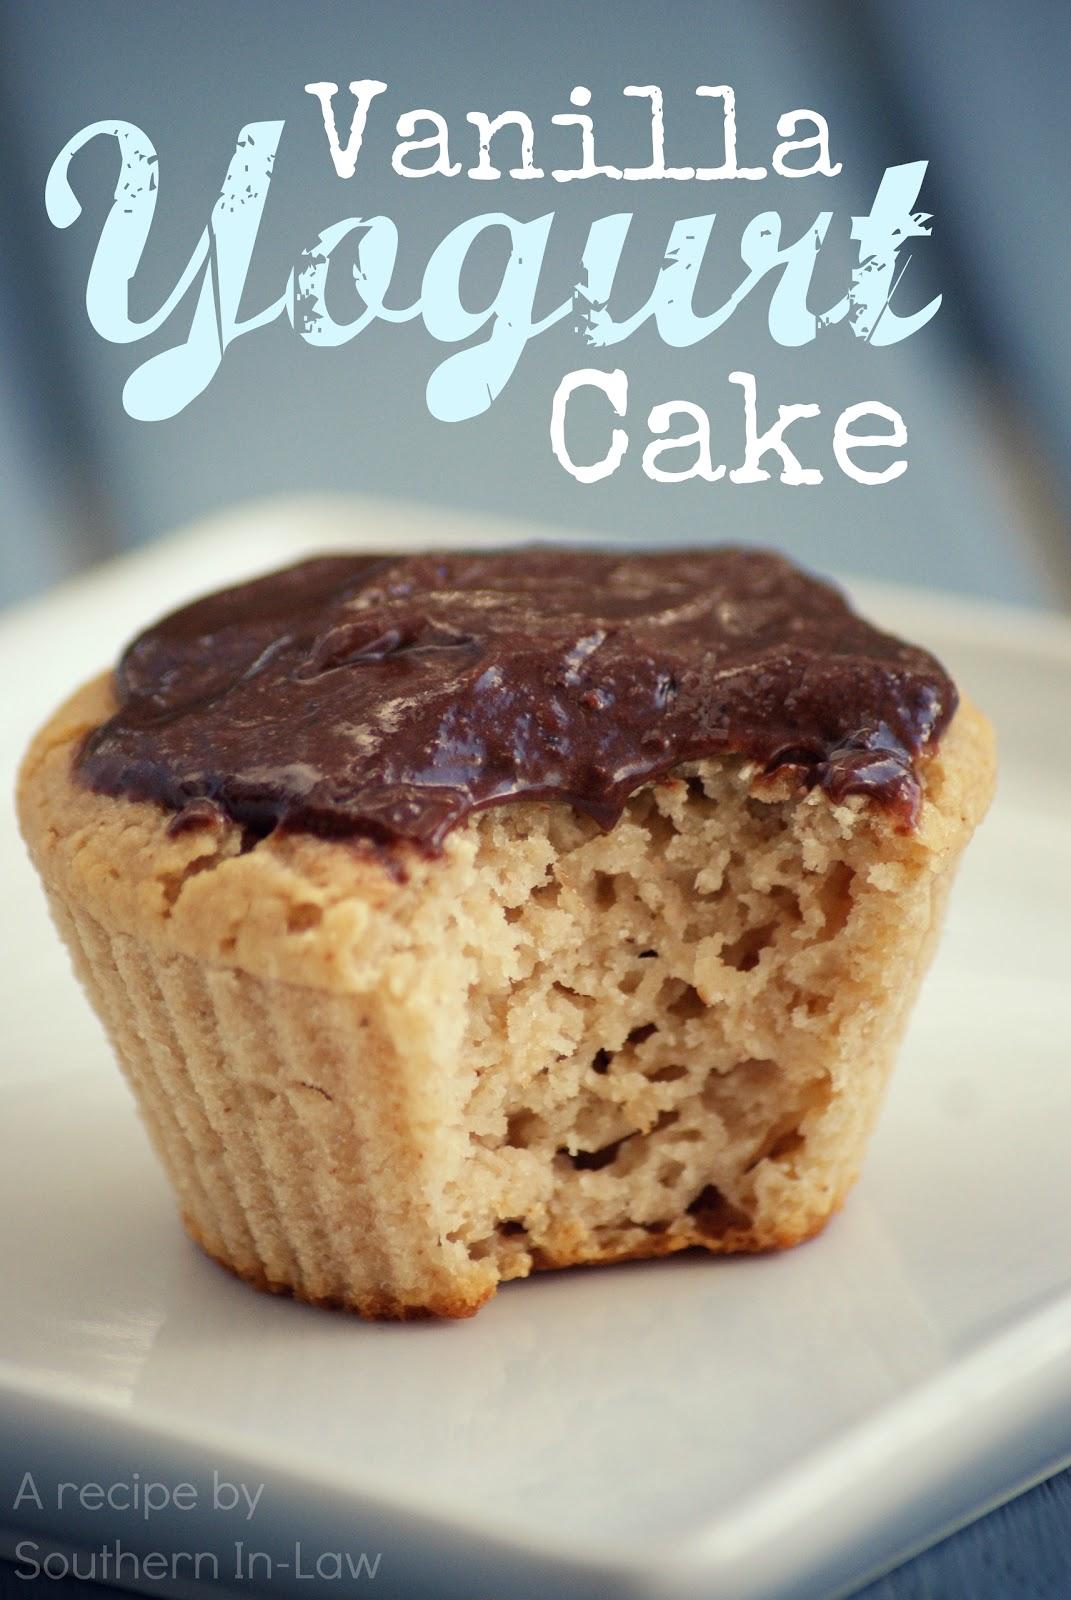 Moist Synonym Cake